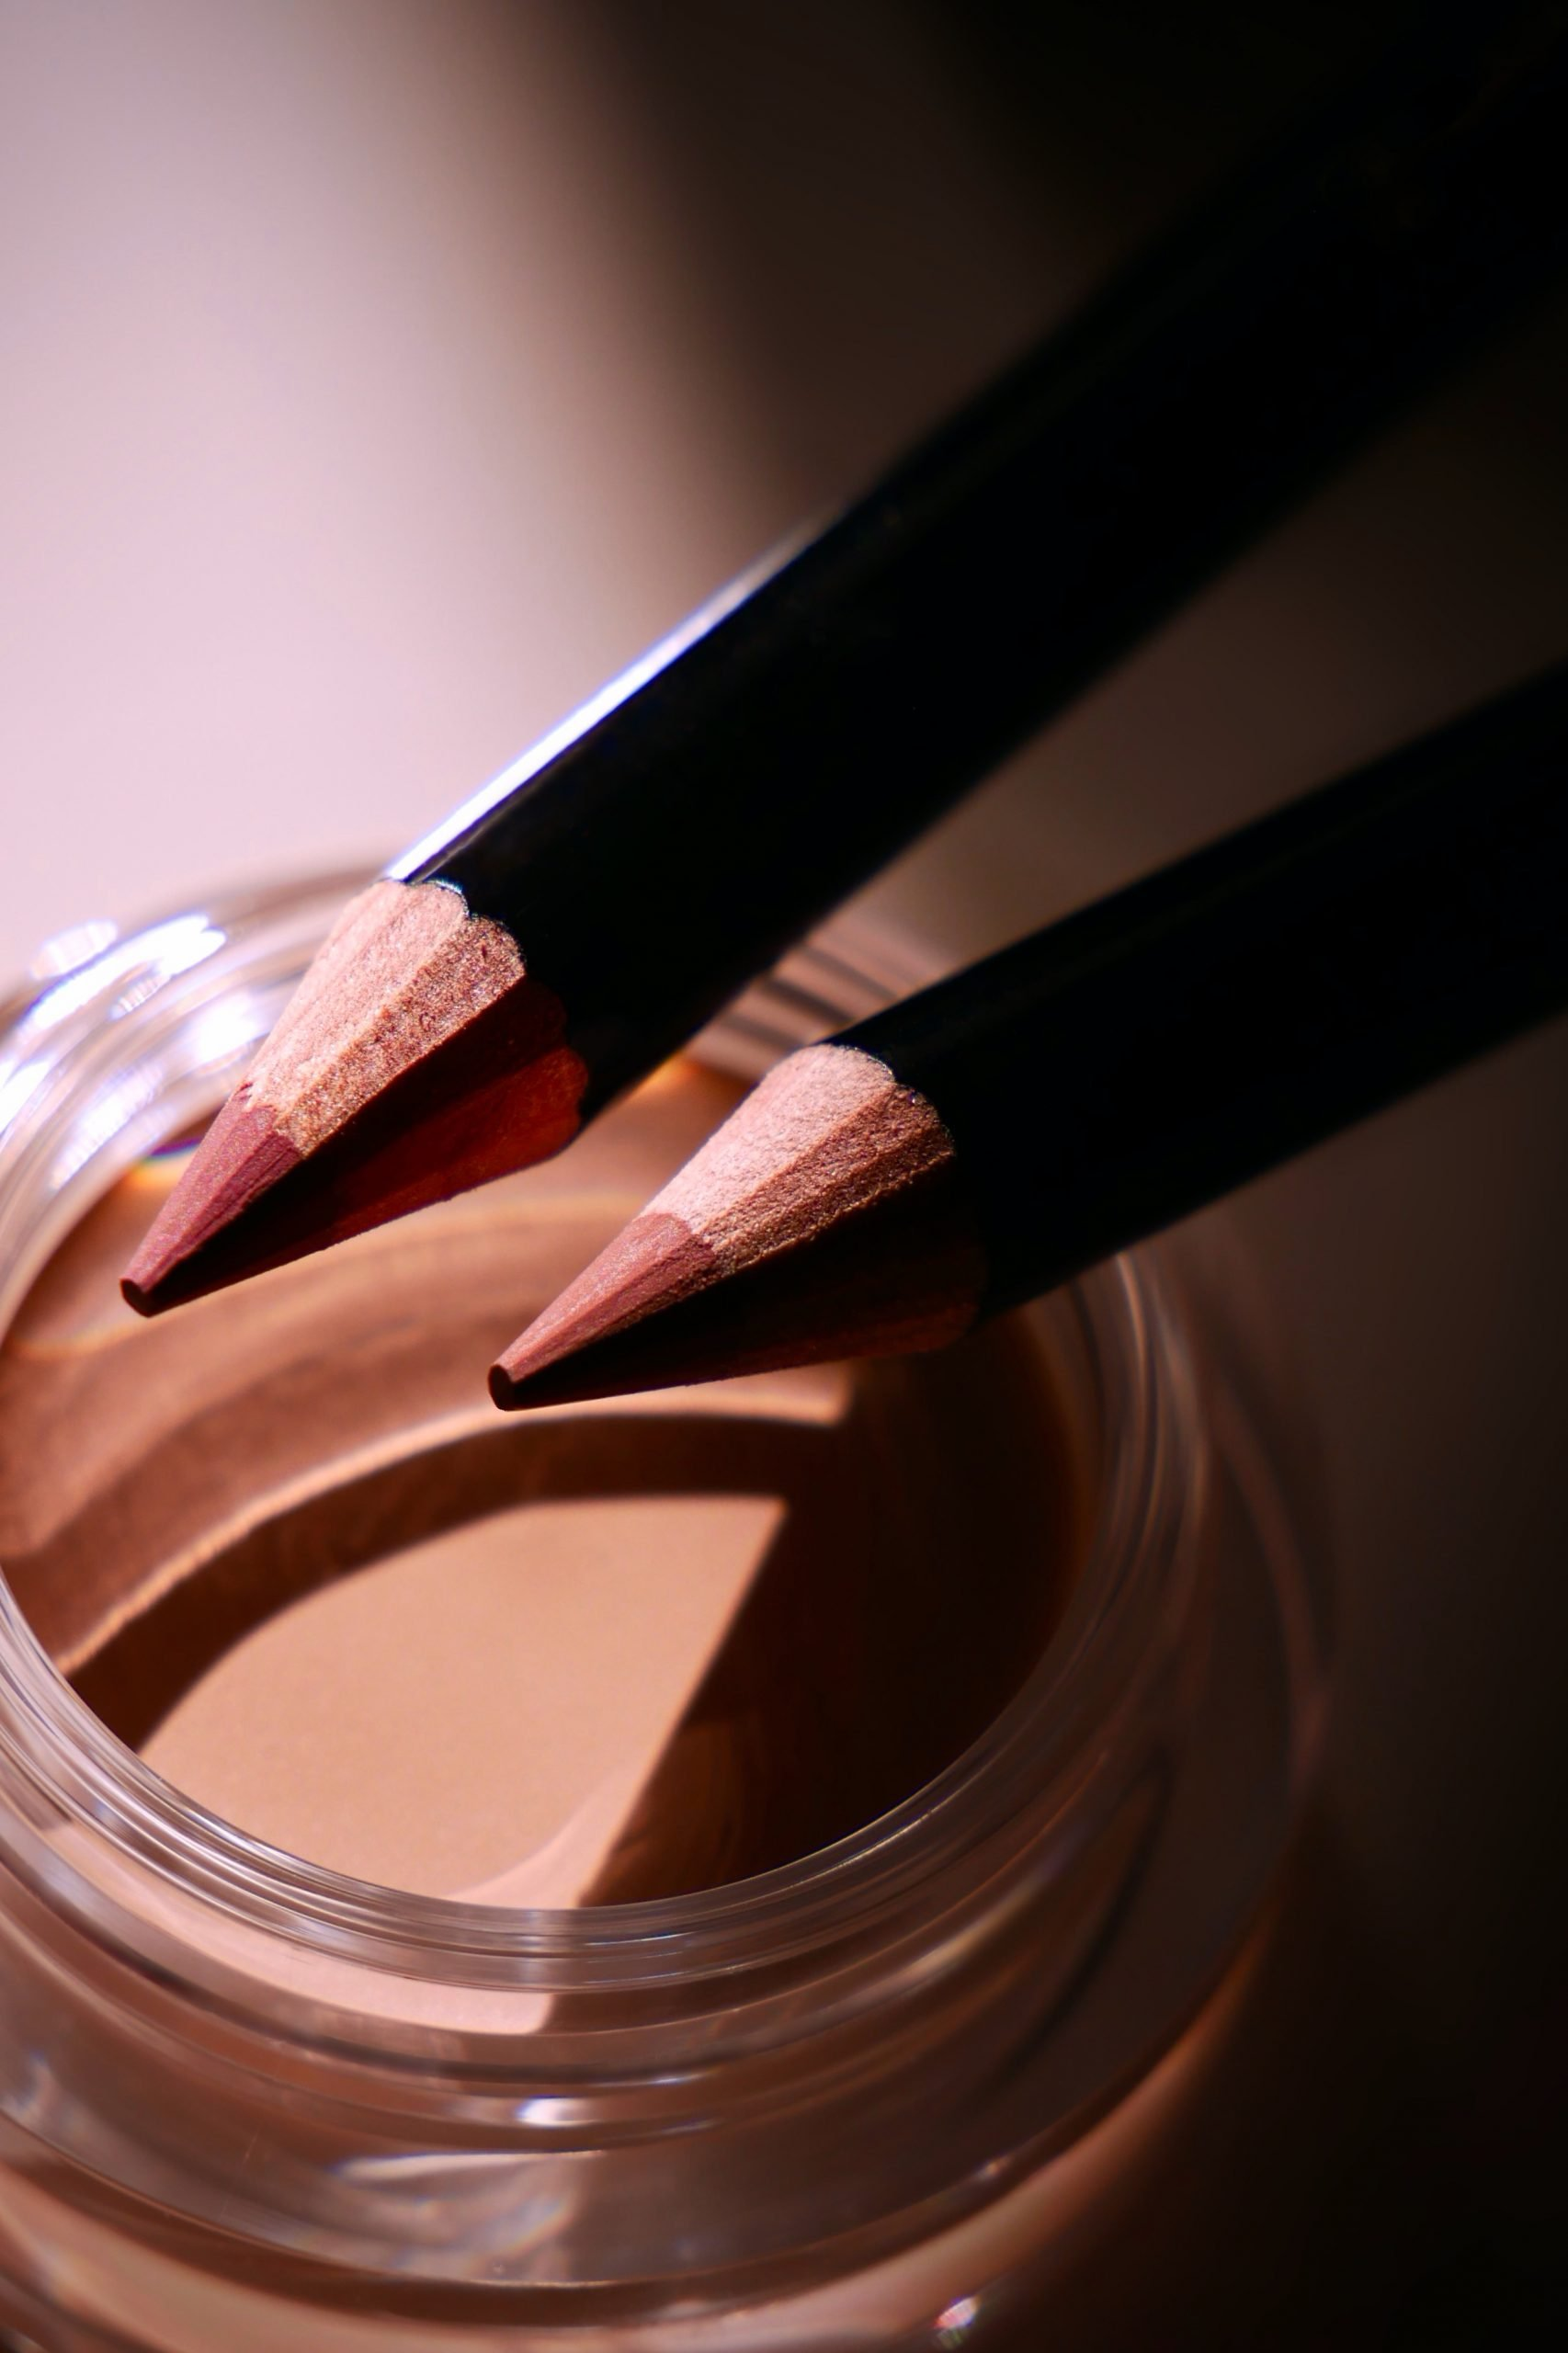 Victoria Beckham Beauty Lip Definers, 02, 03, Tori Vale, Tori Vale Photography, Beauty Product Photography